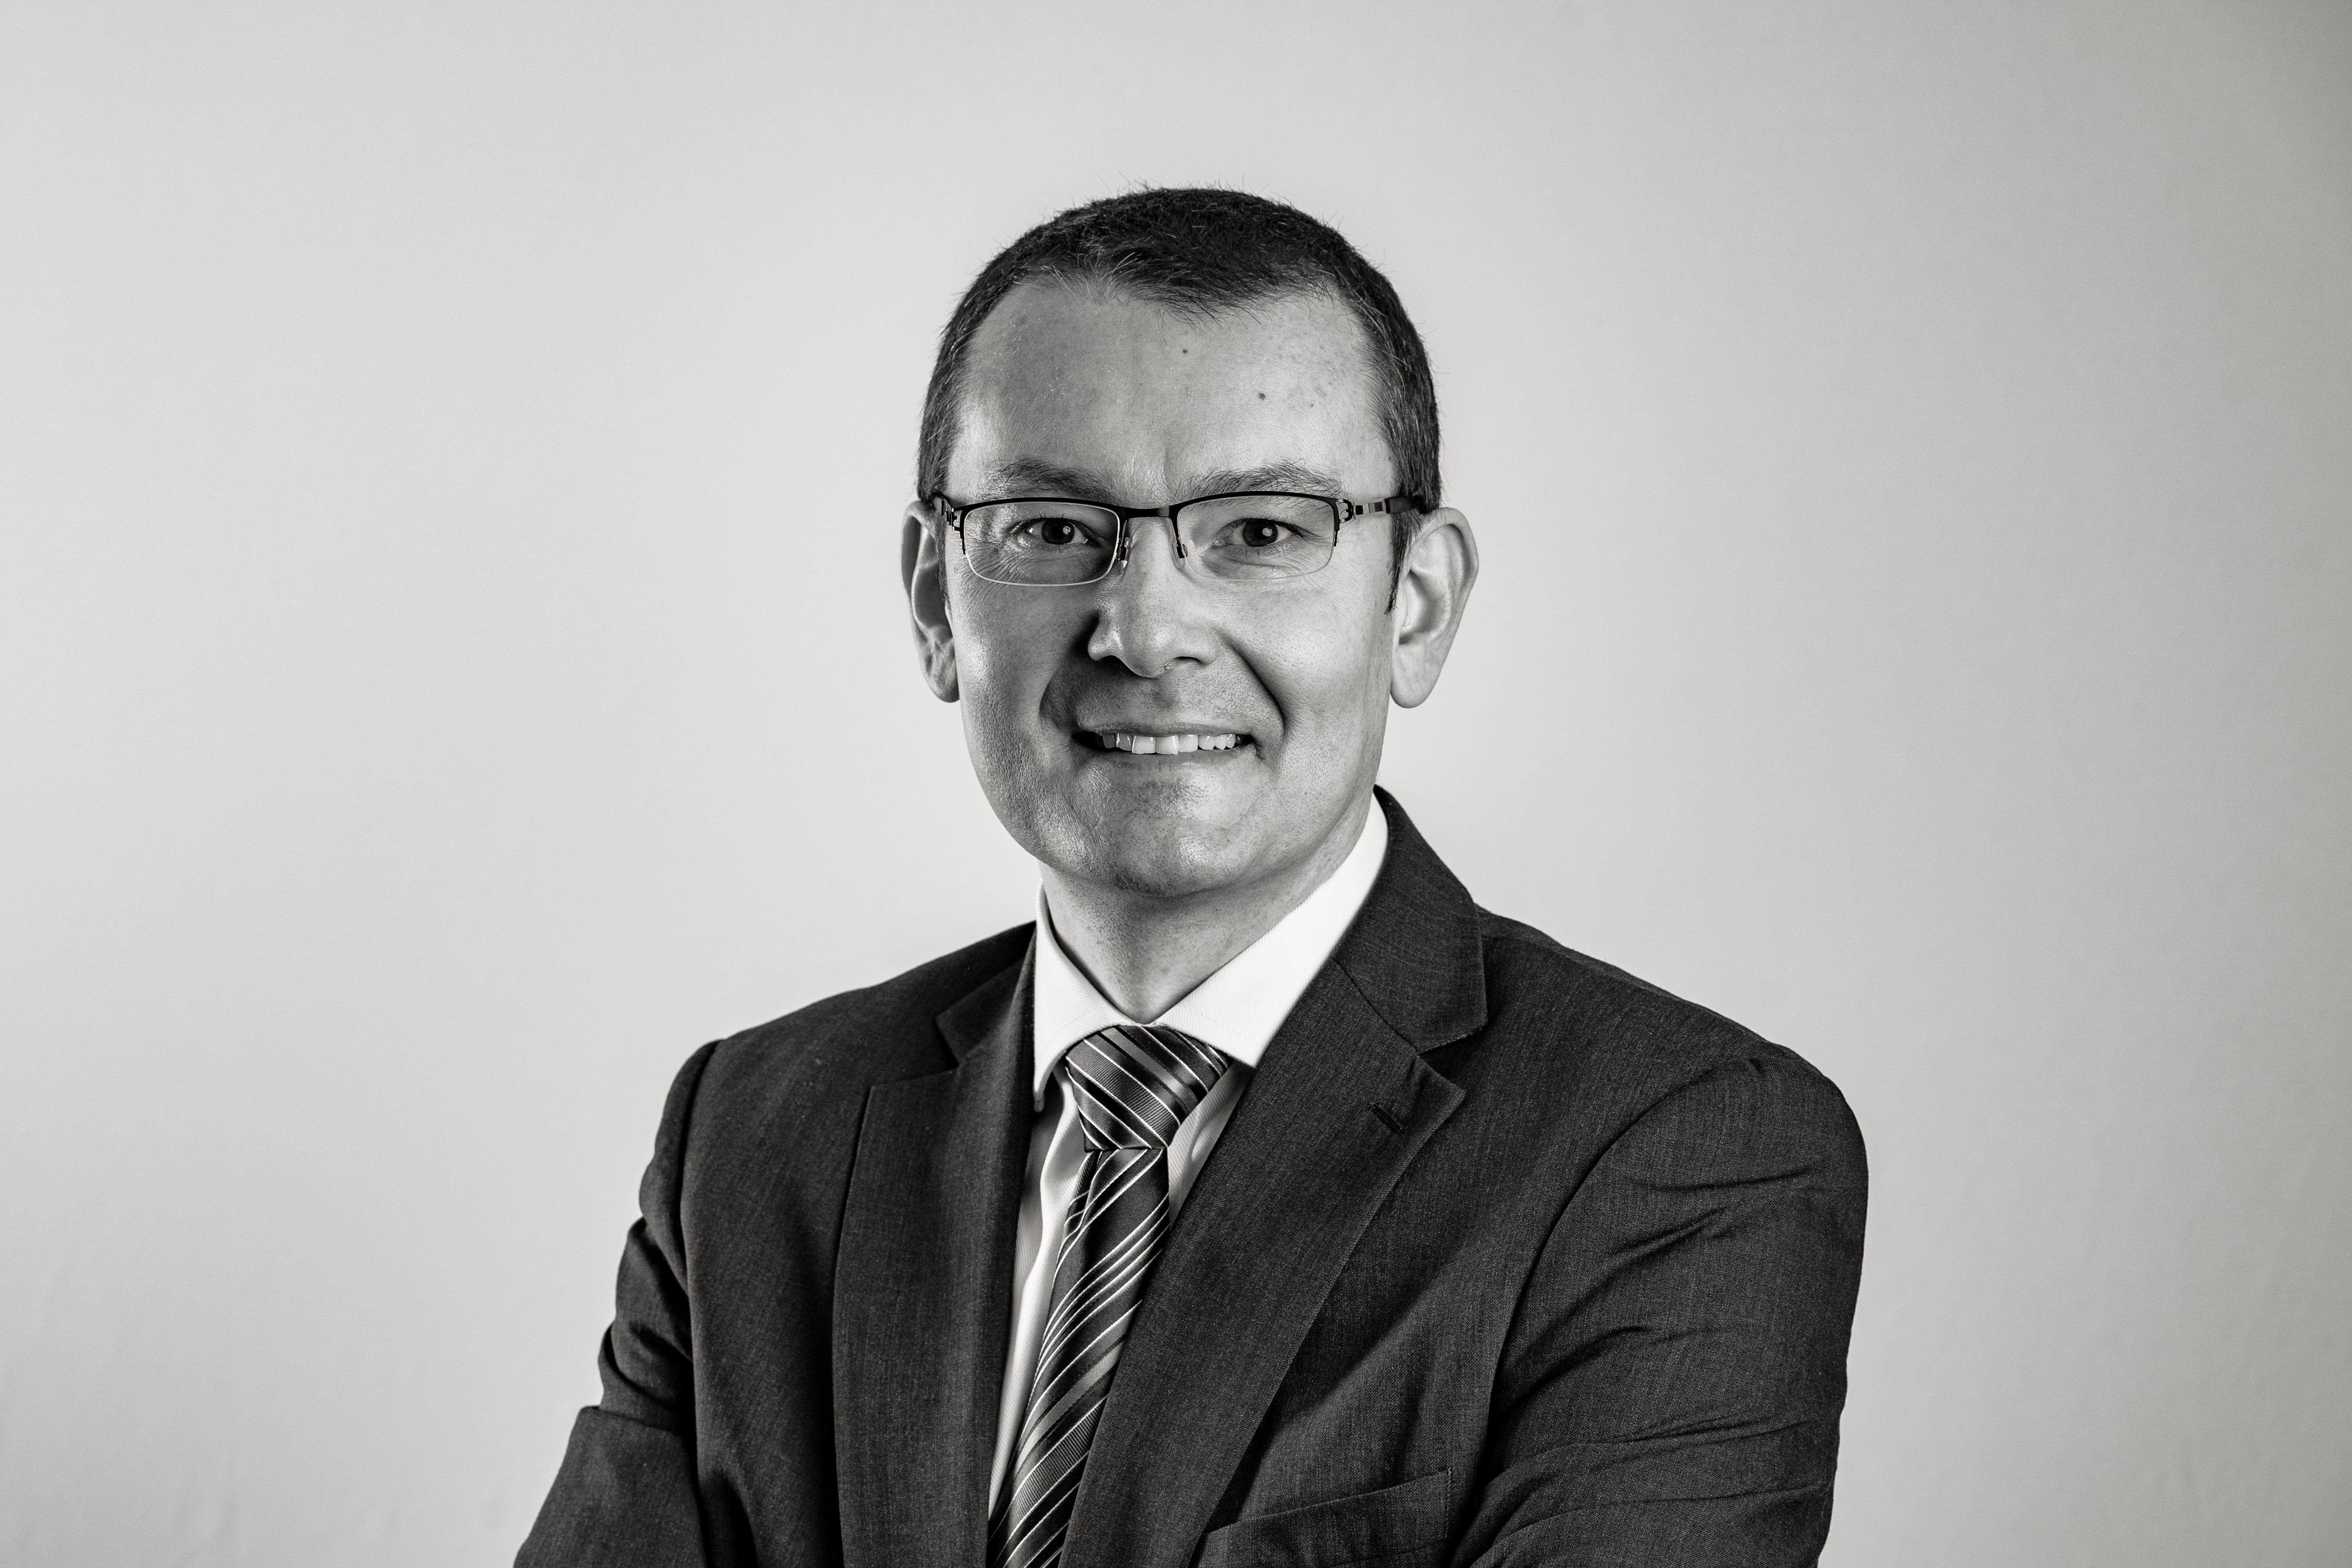 Professor Milan Radosavljevic